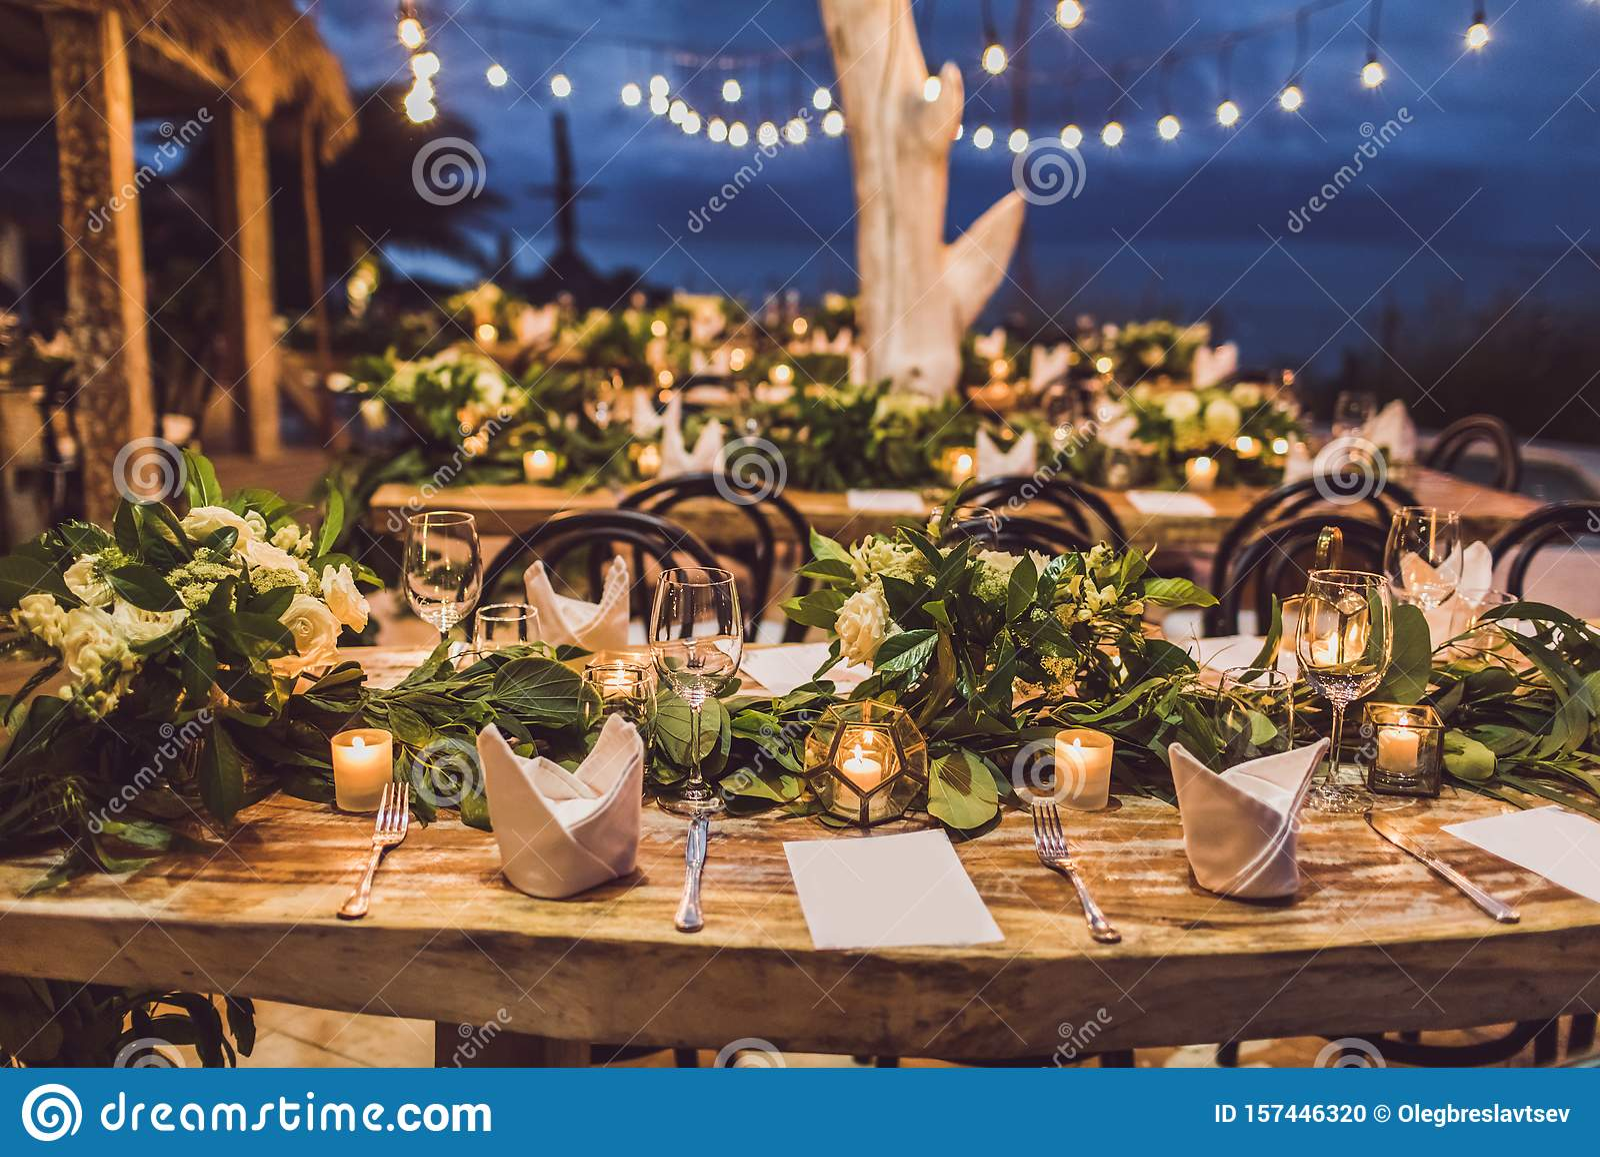 Table setting decoration at night wedding ceremony